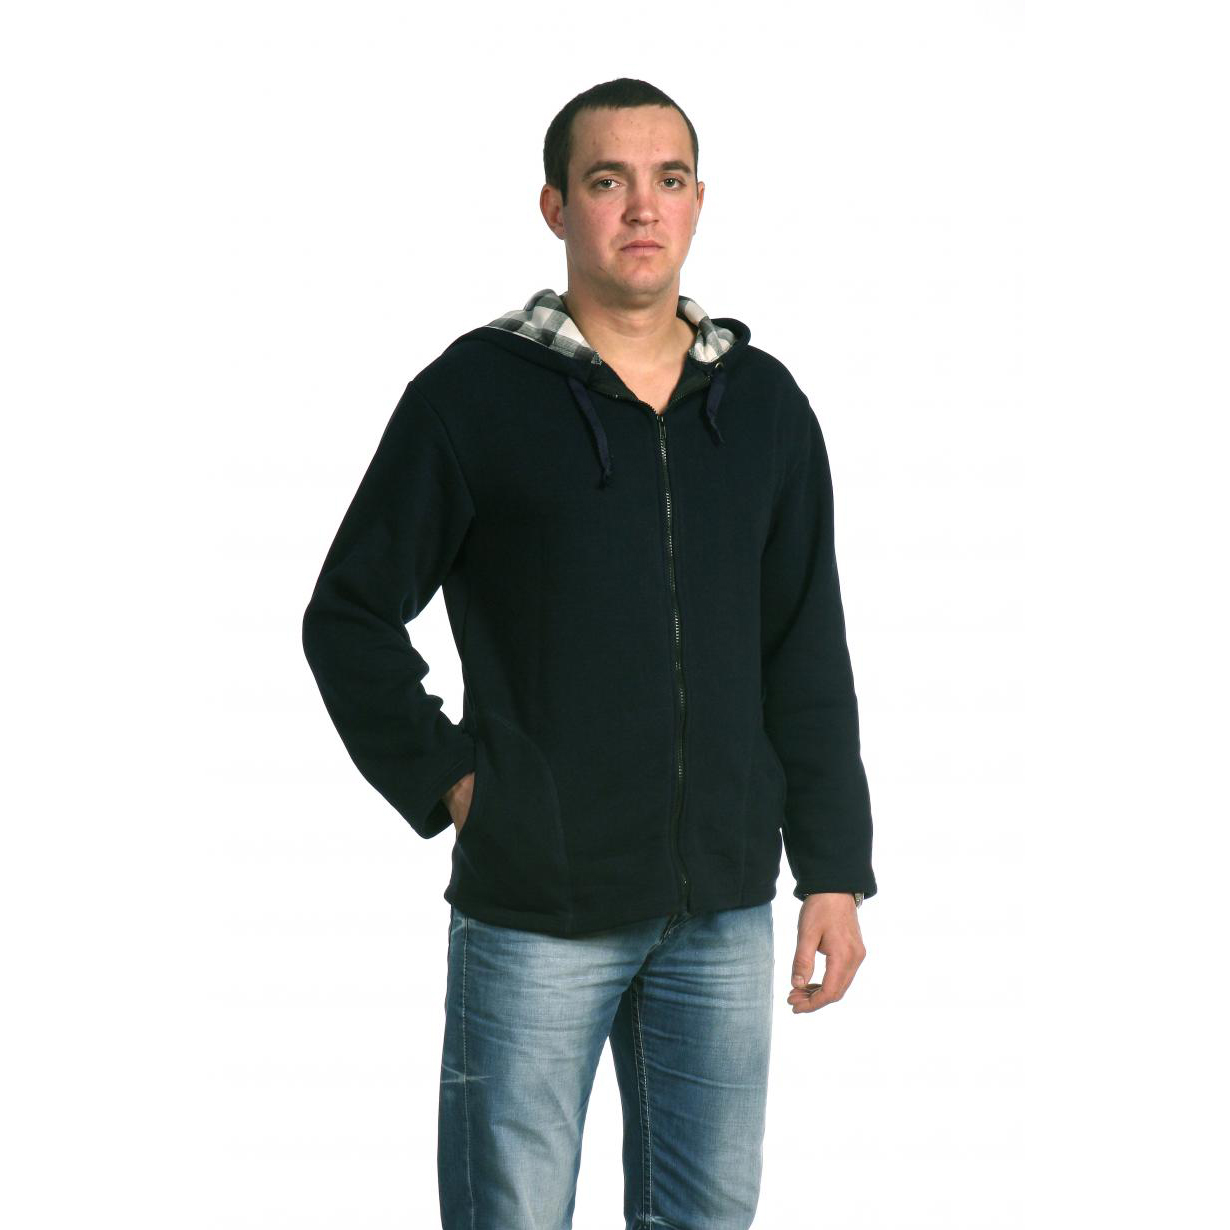 Мужская толстовка «Денвер», размер 48Толстовки, джемпера и рубашки<br>Обхват груди:96 см<br>Обхват талии:88 см<br>Обхват бедер:102 см<br>Рост:172-180 см<br><br>Тип: Муж. толстовка<br>Размер: 48<br>Материал: Футер